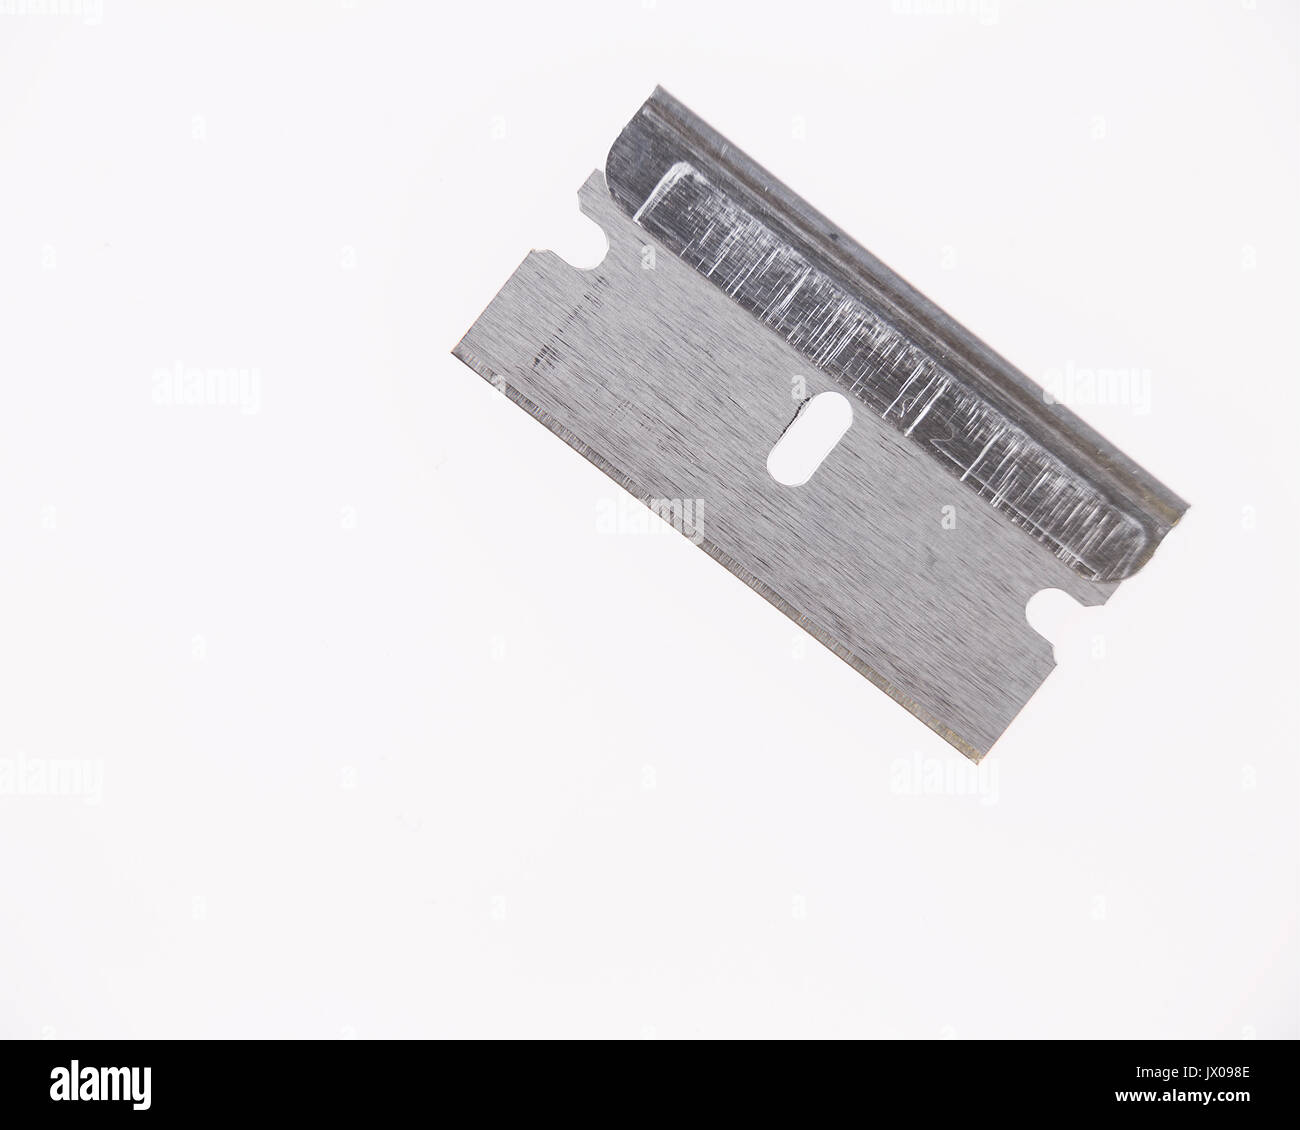 Isolated Razor Blade - Stock Image